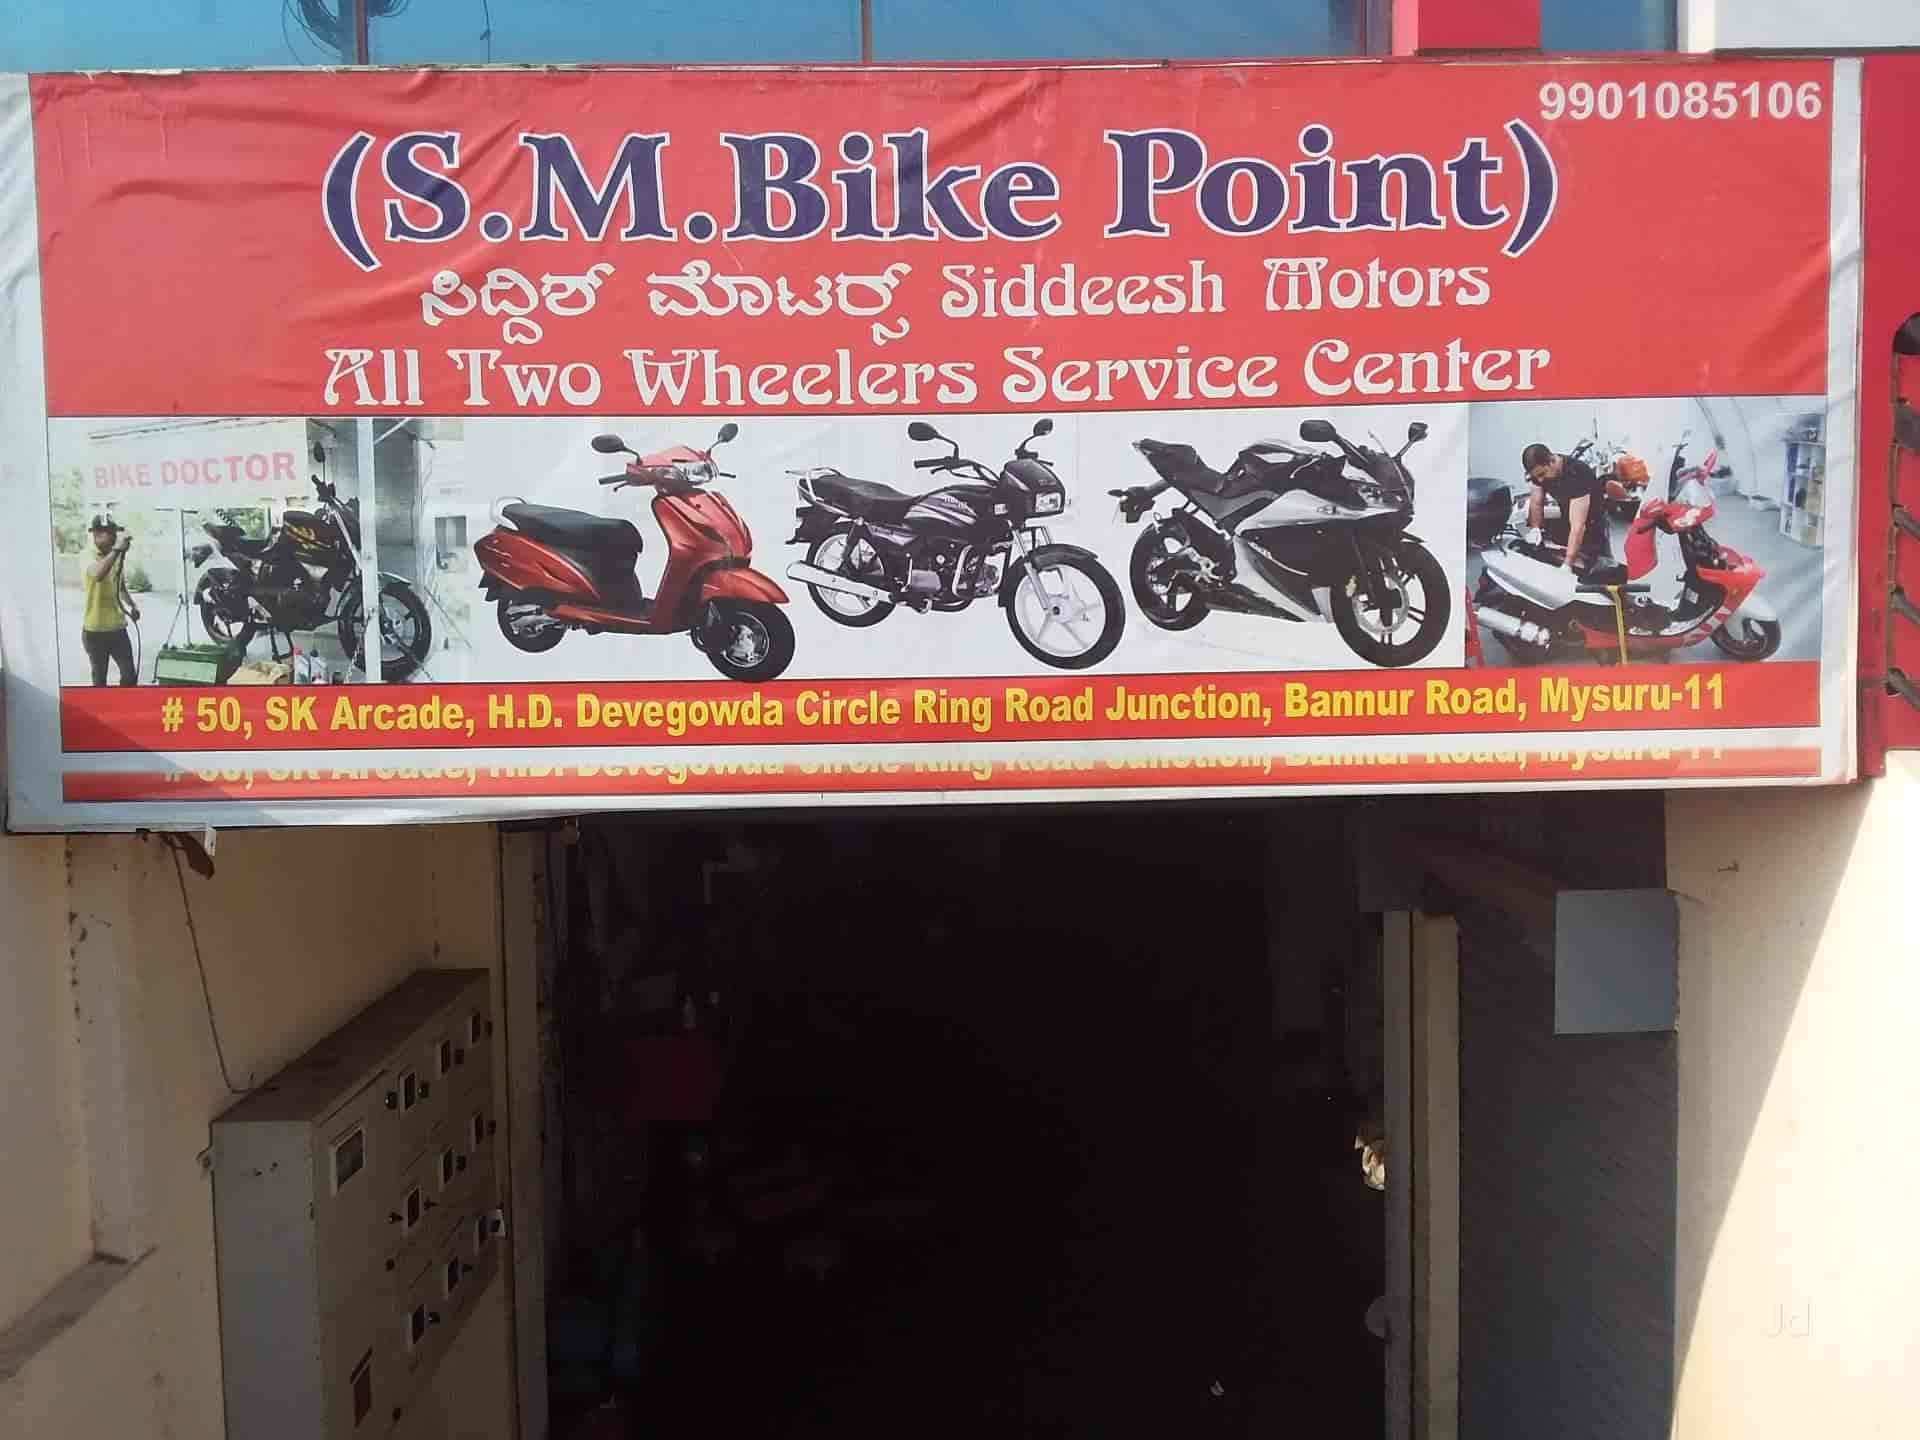 ... Siddeesh Motors Photos, Alanahalli, Mysore - Motorcycle Repair & Services ...